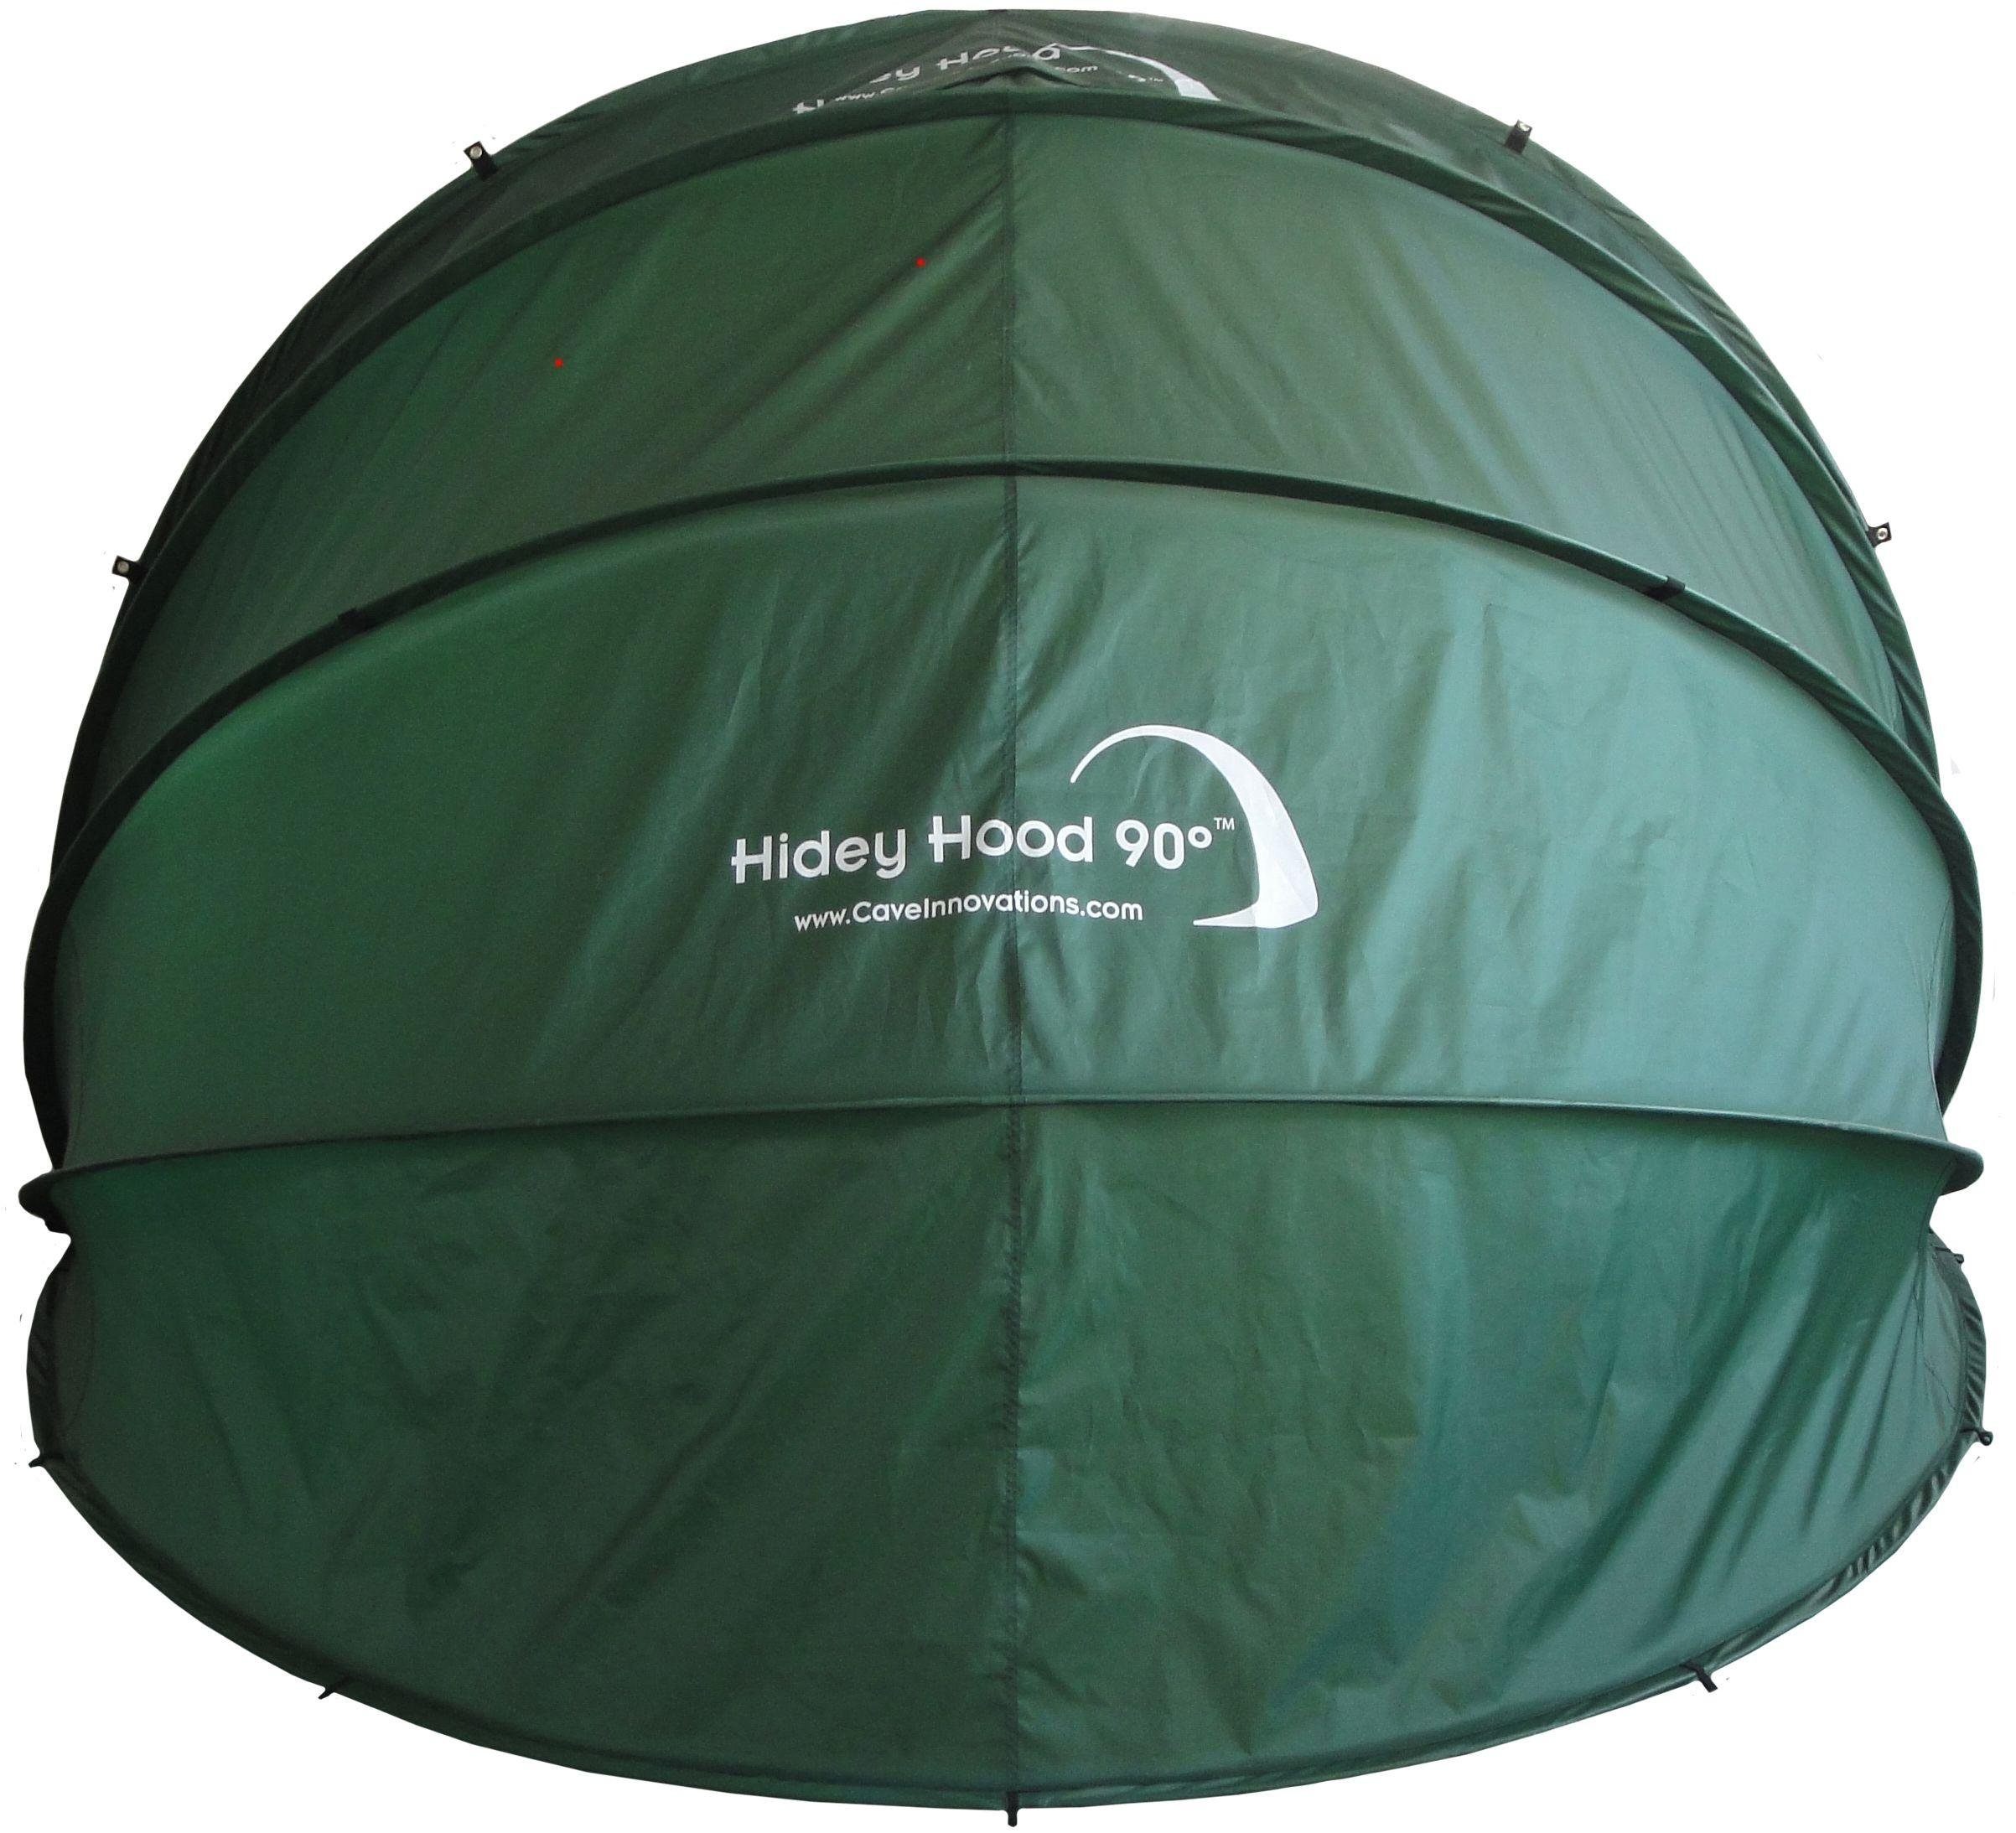 hidey-hood-90-wall-mounted-outdoor-storage